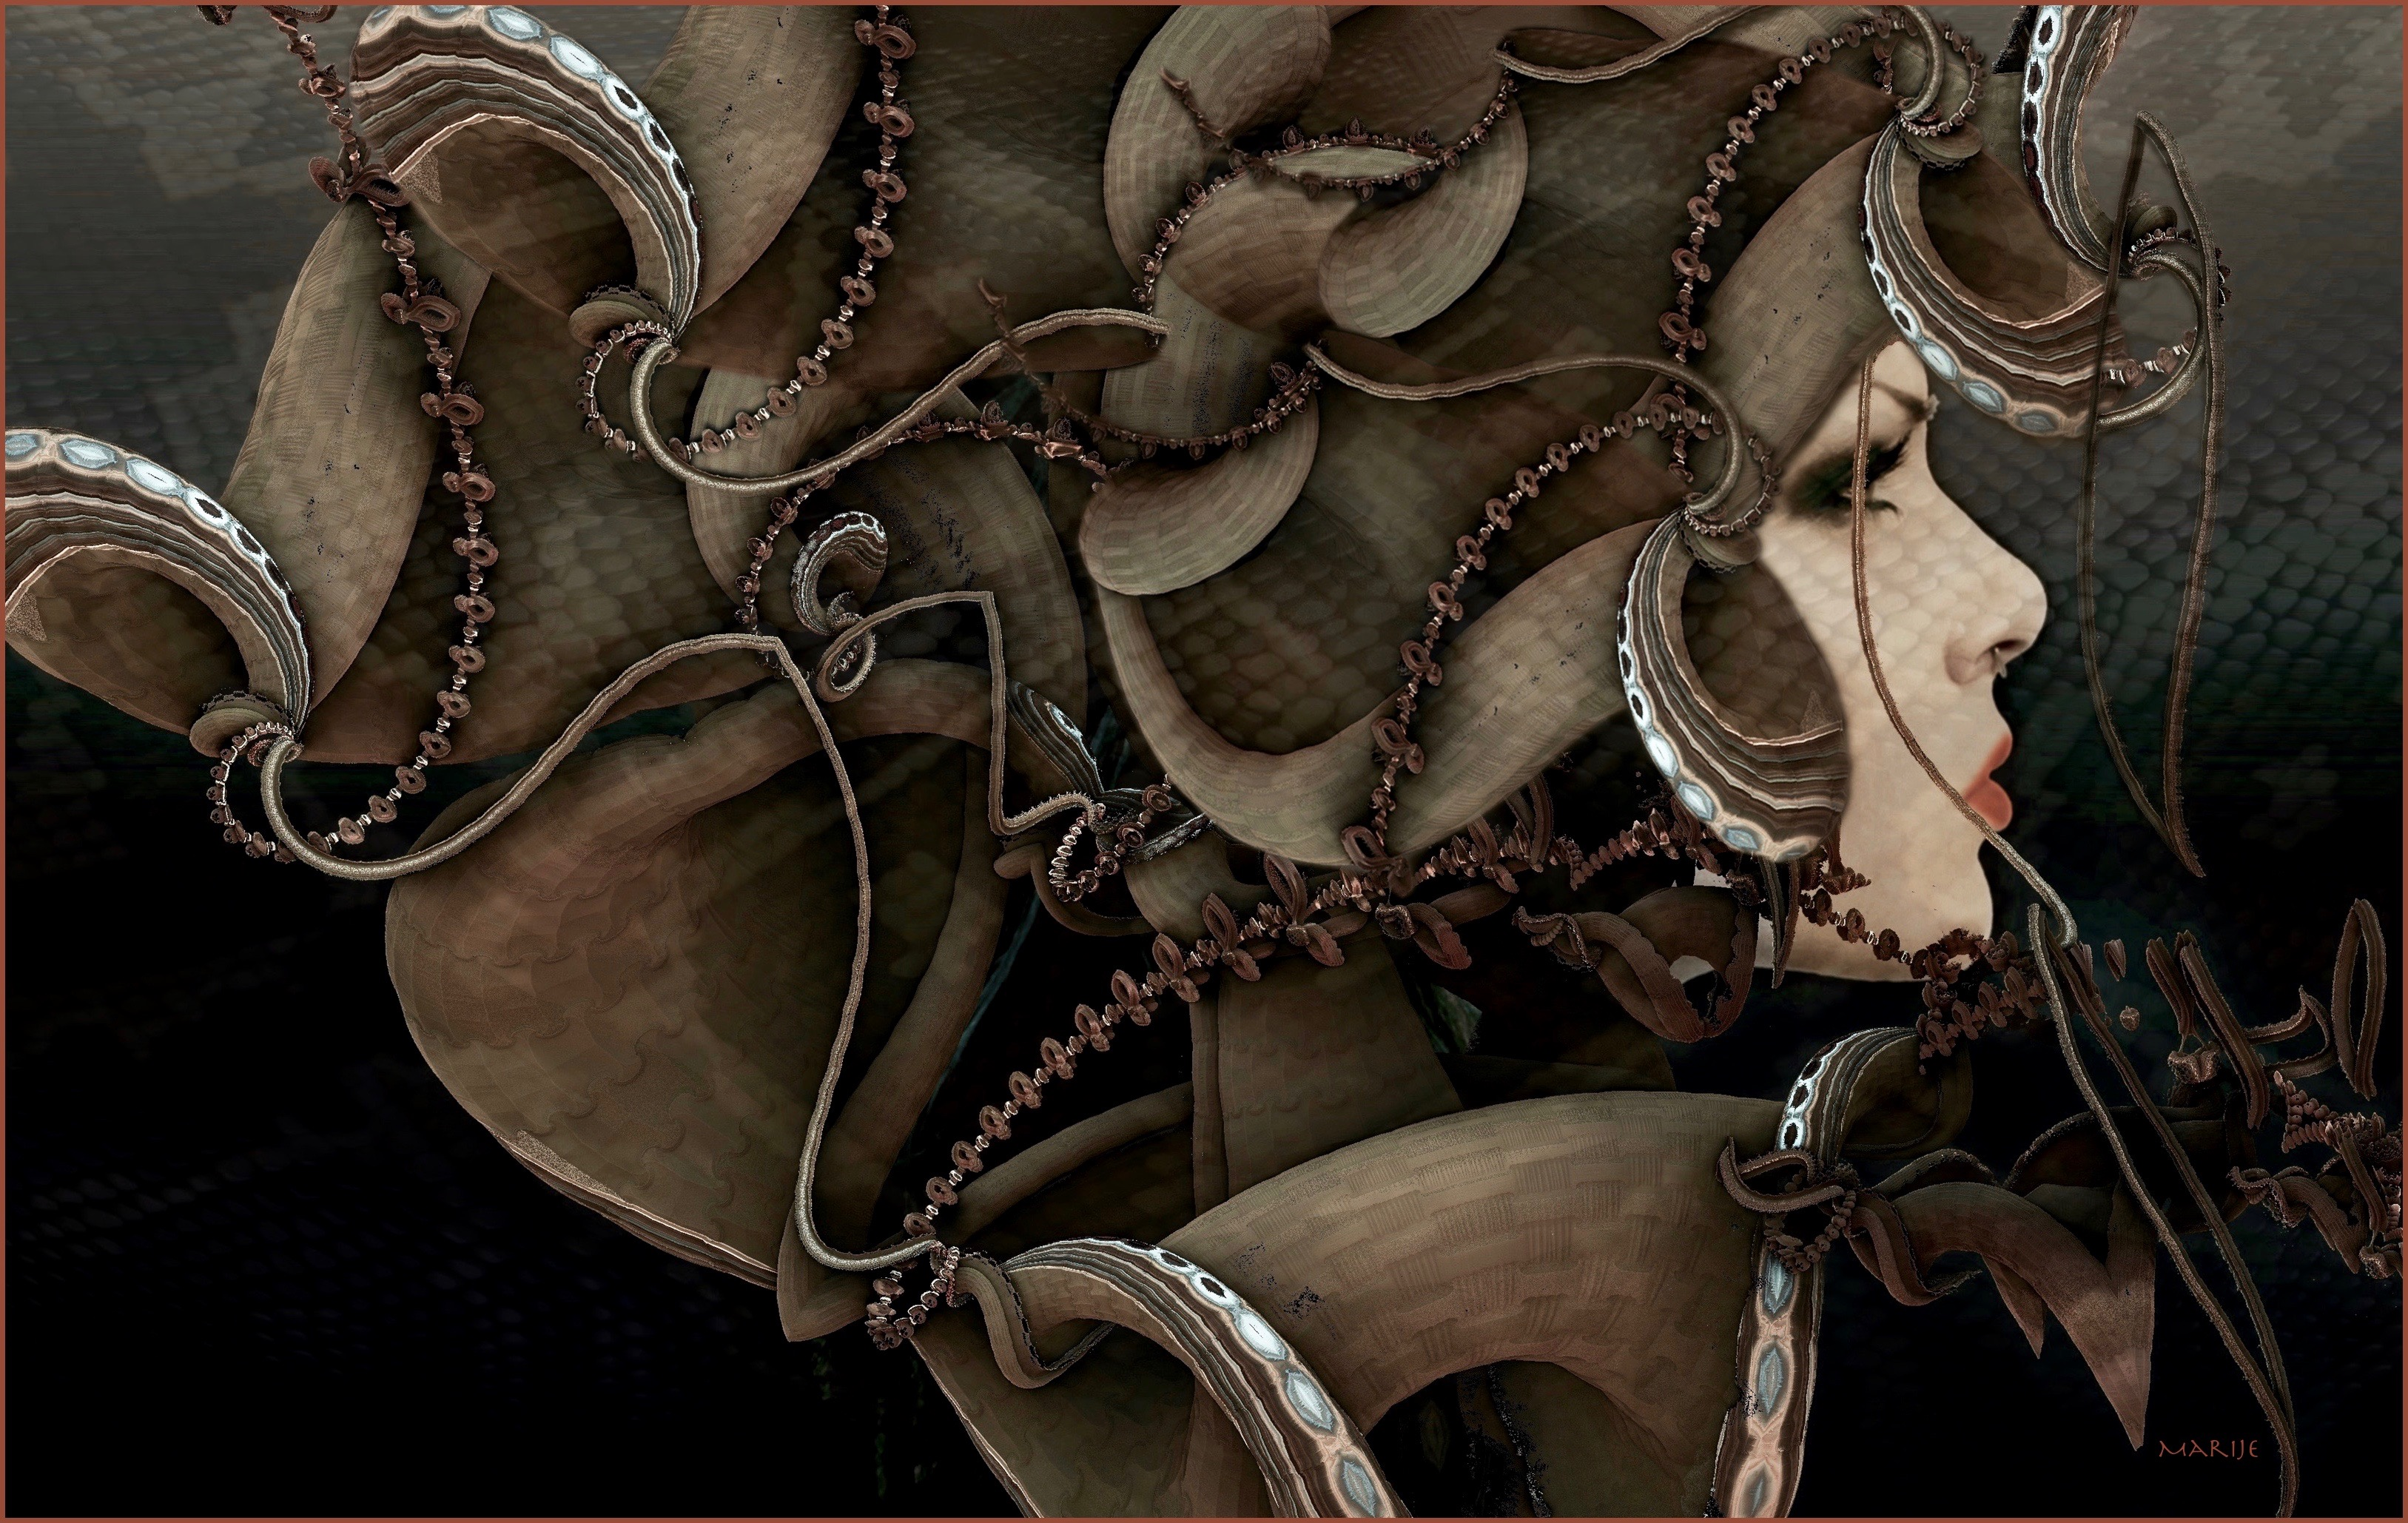 Medusa by marijeberting